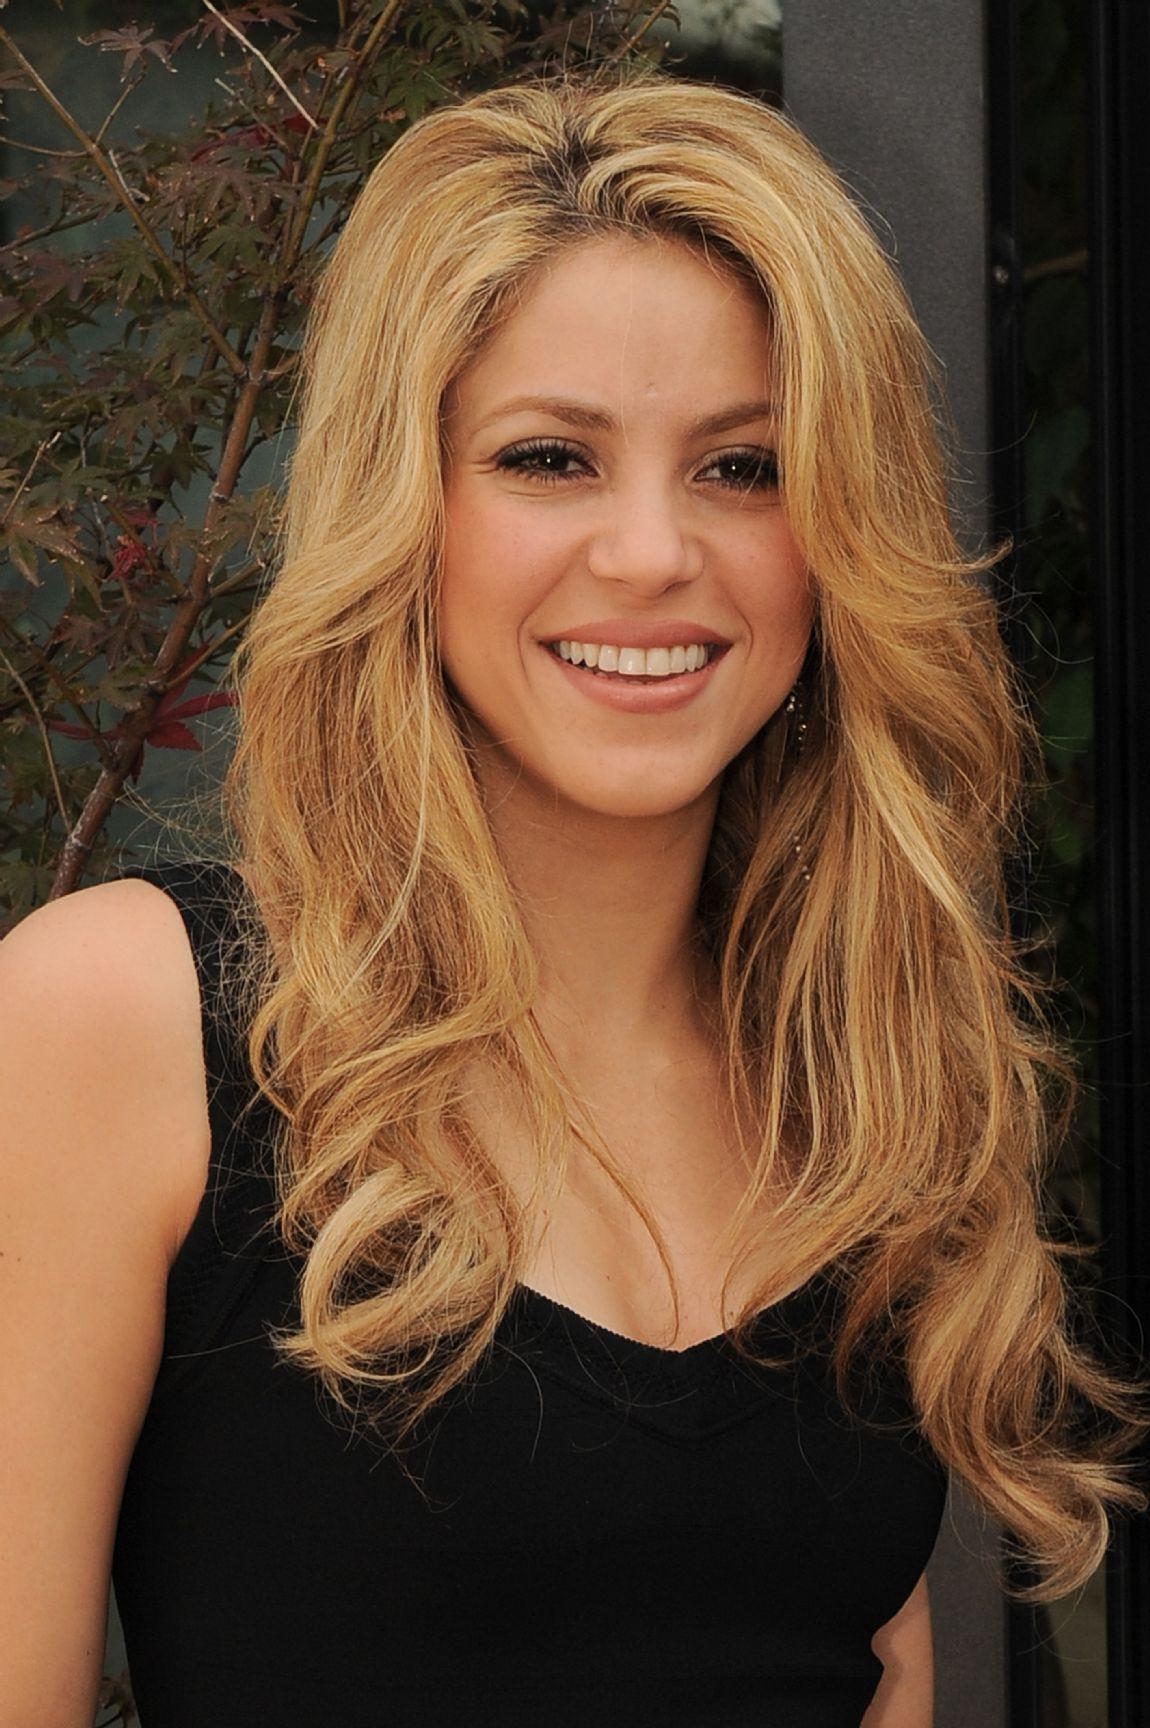 Shakira Mebarak photo gallery - high quality pics of ... Shakira